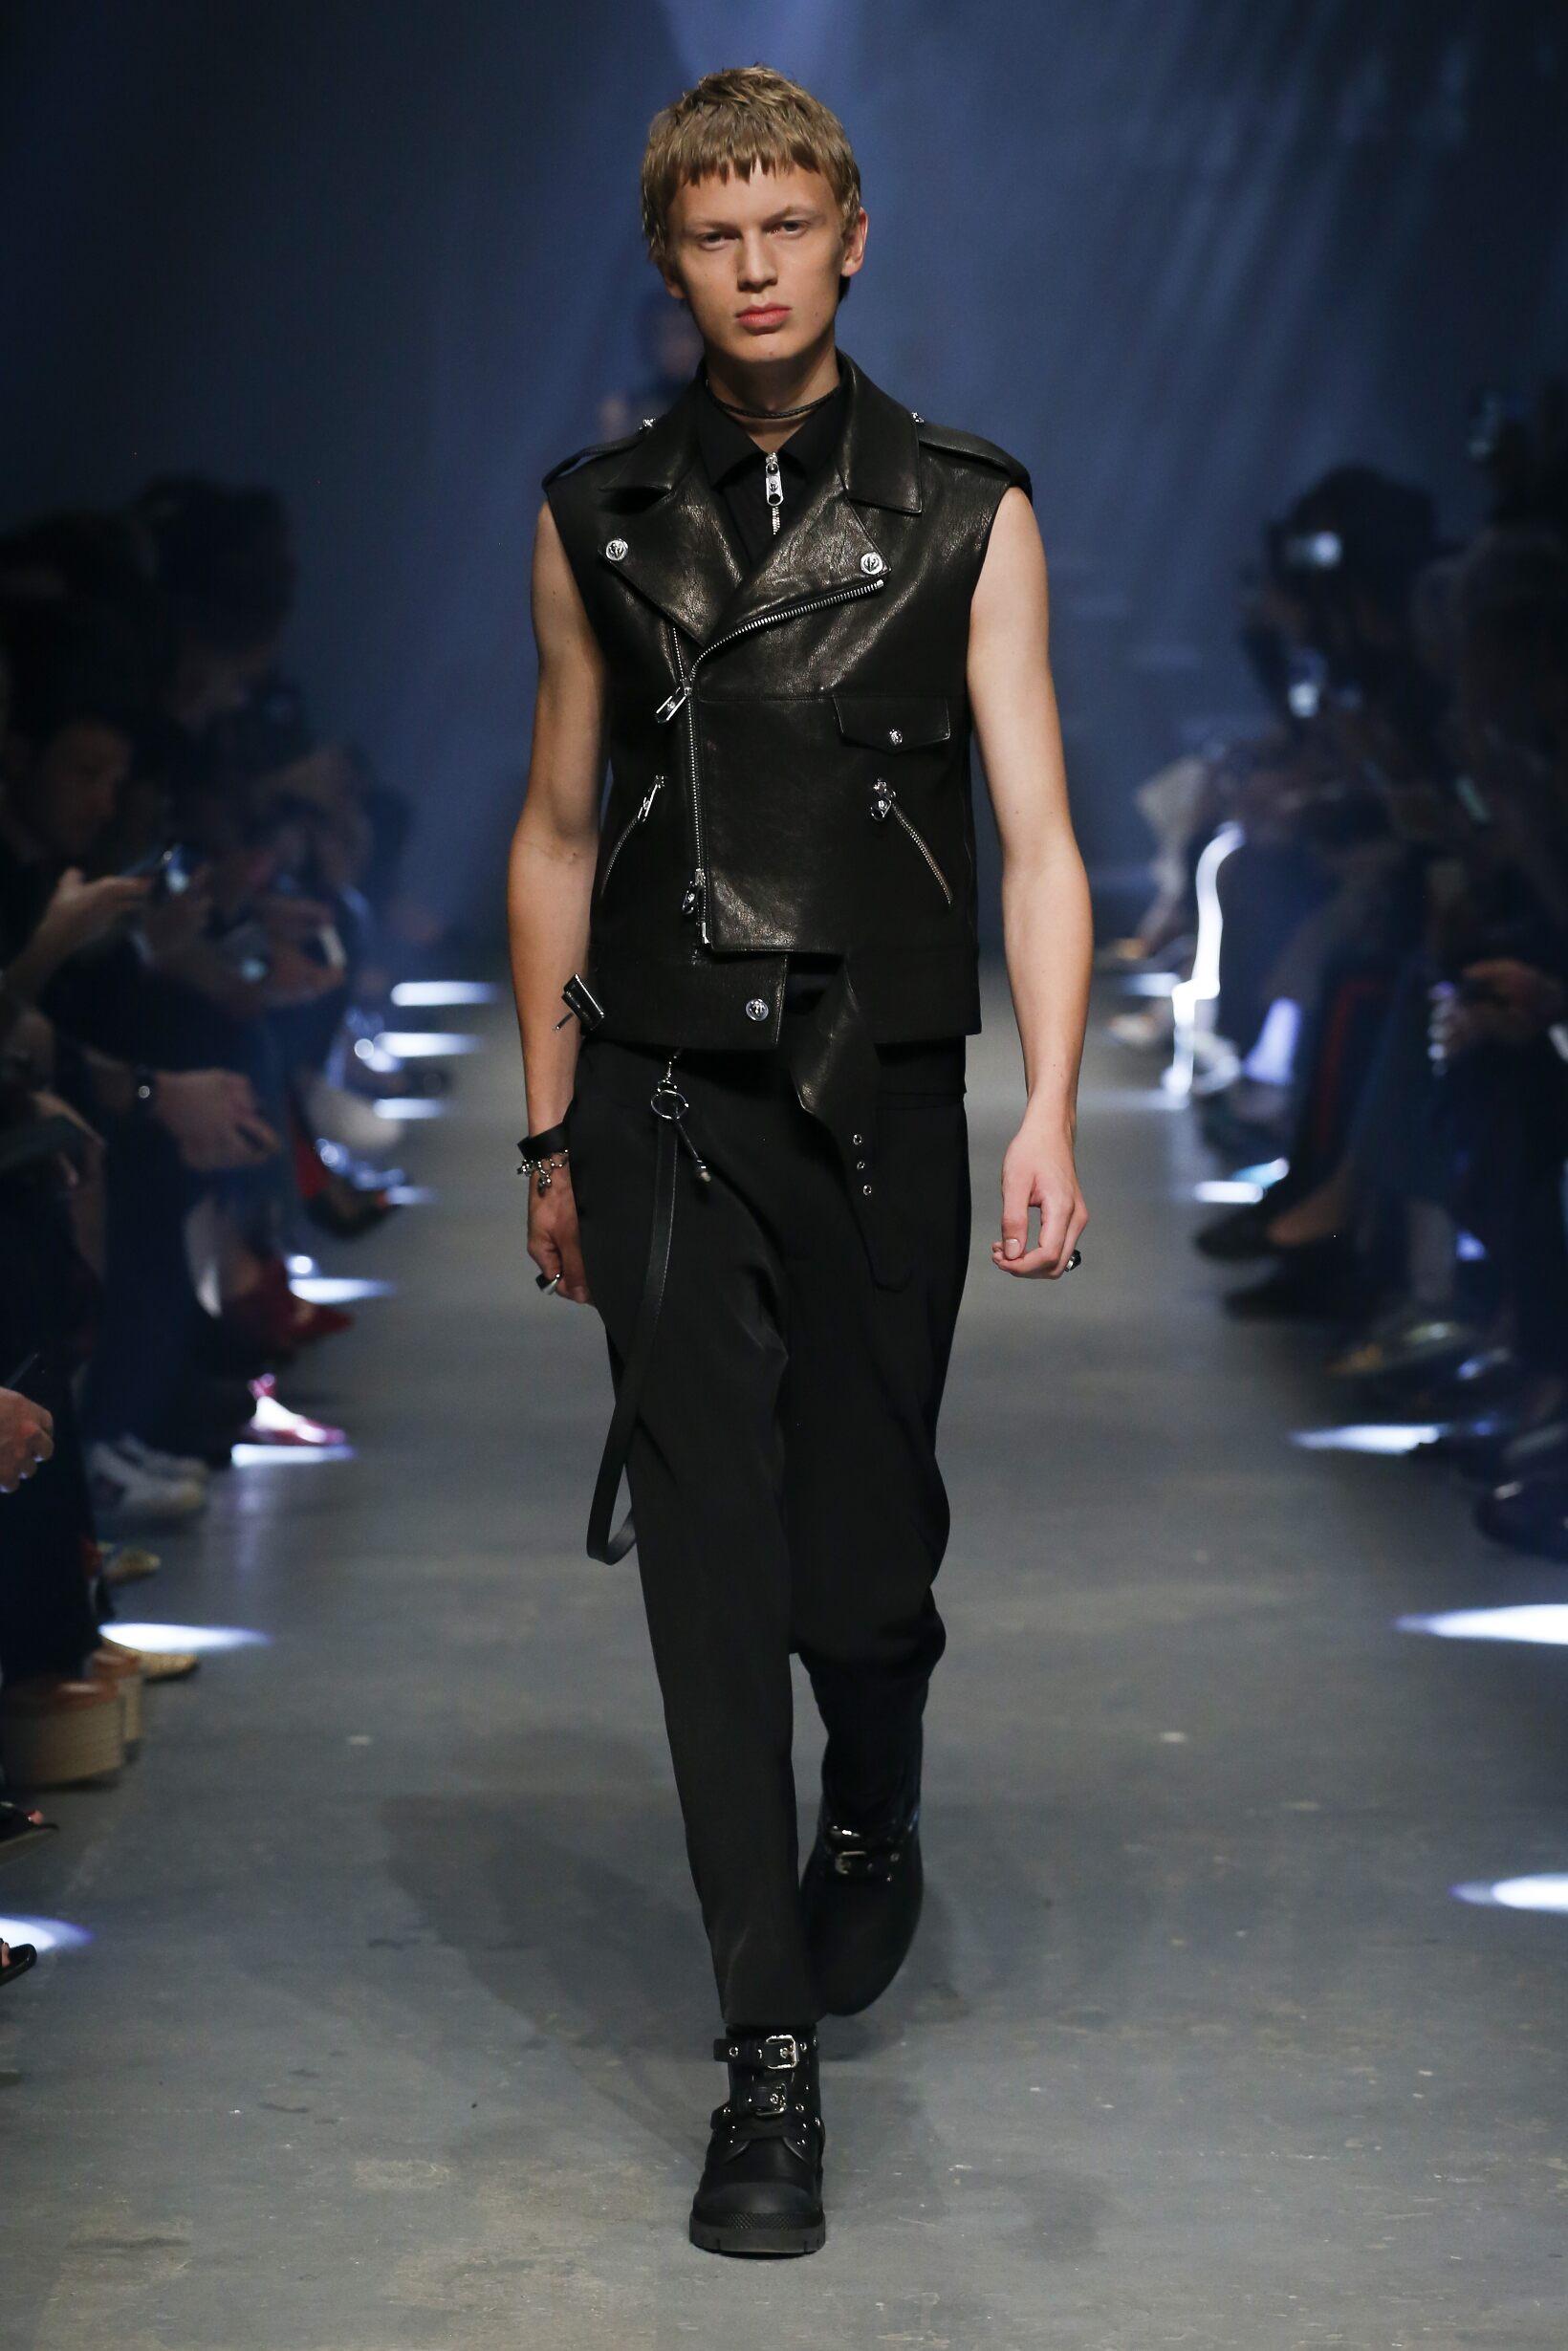 1a63c34c6fff1 Versus Versace London Fashion Week Womenswear